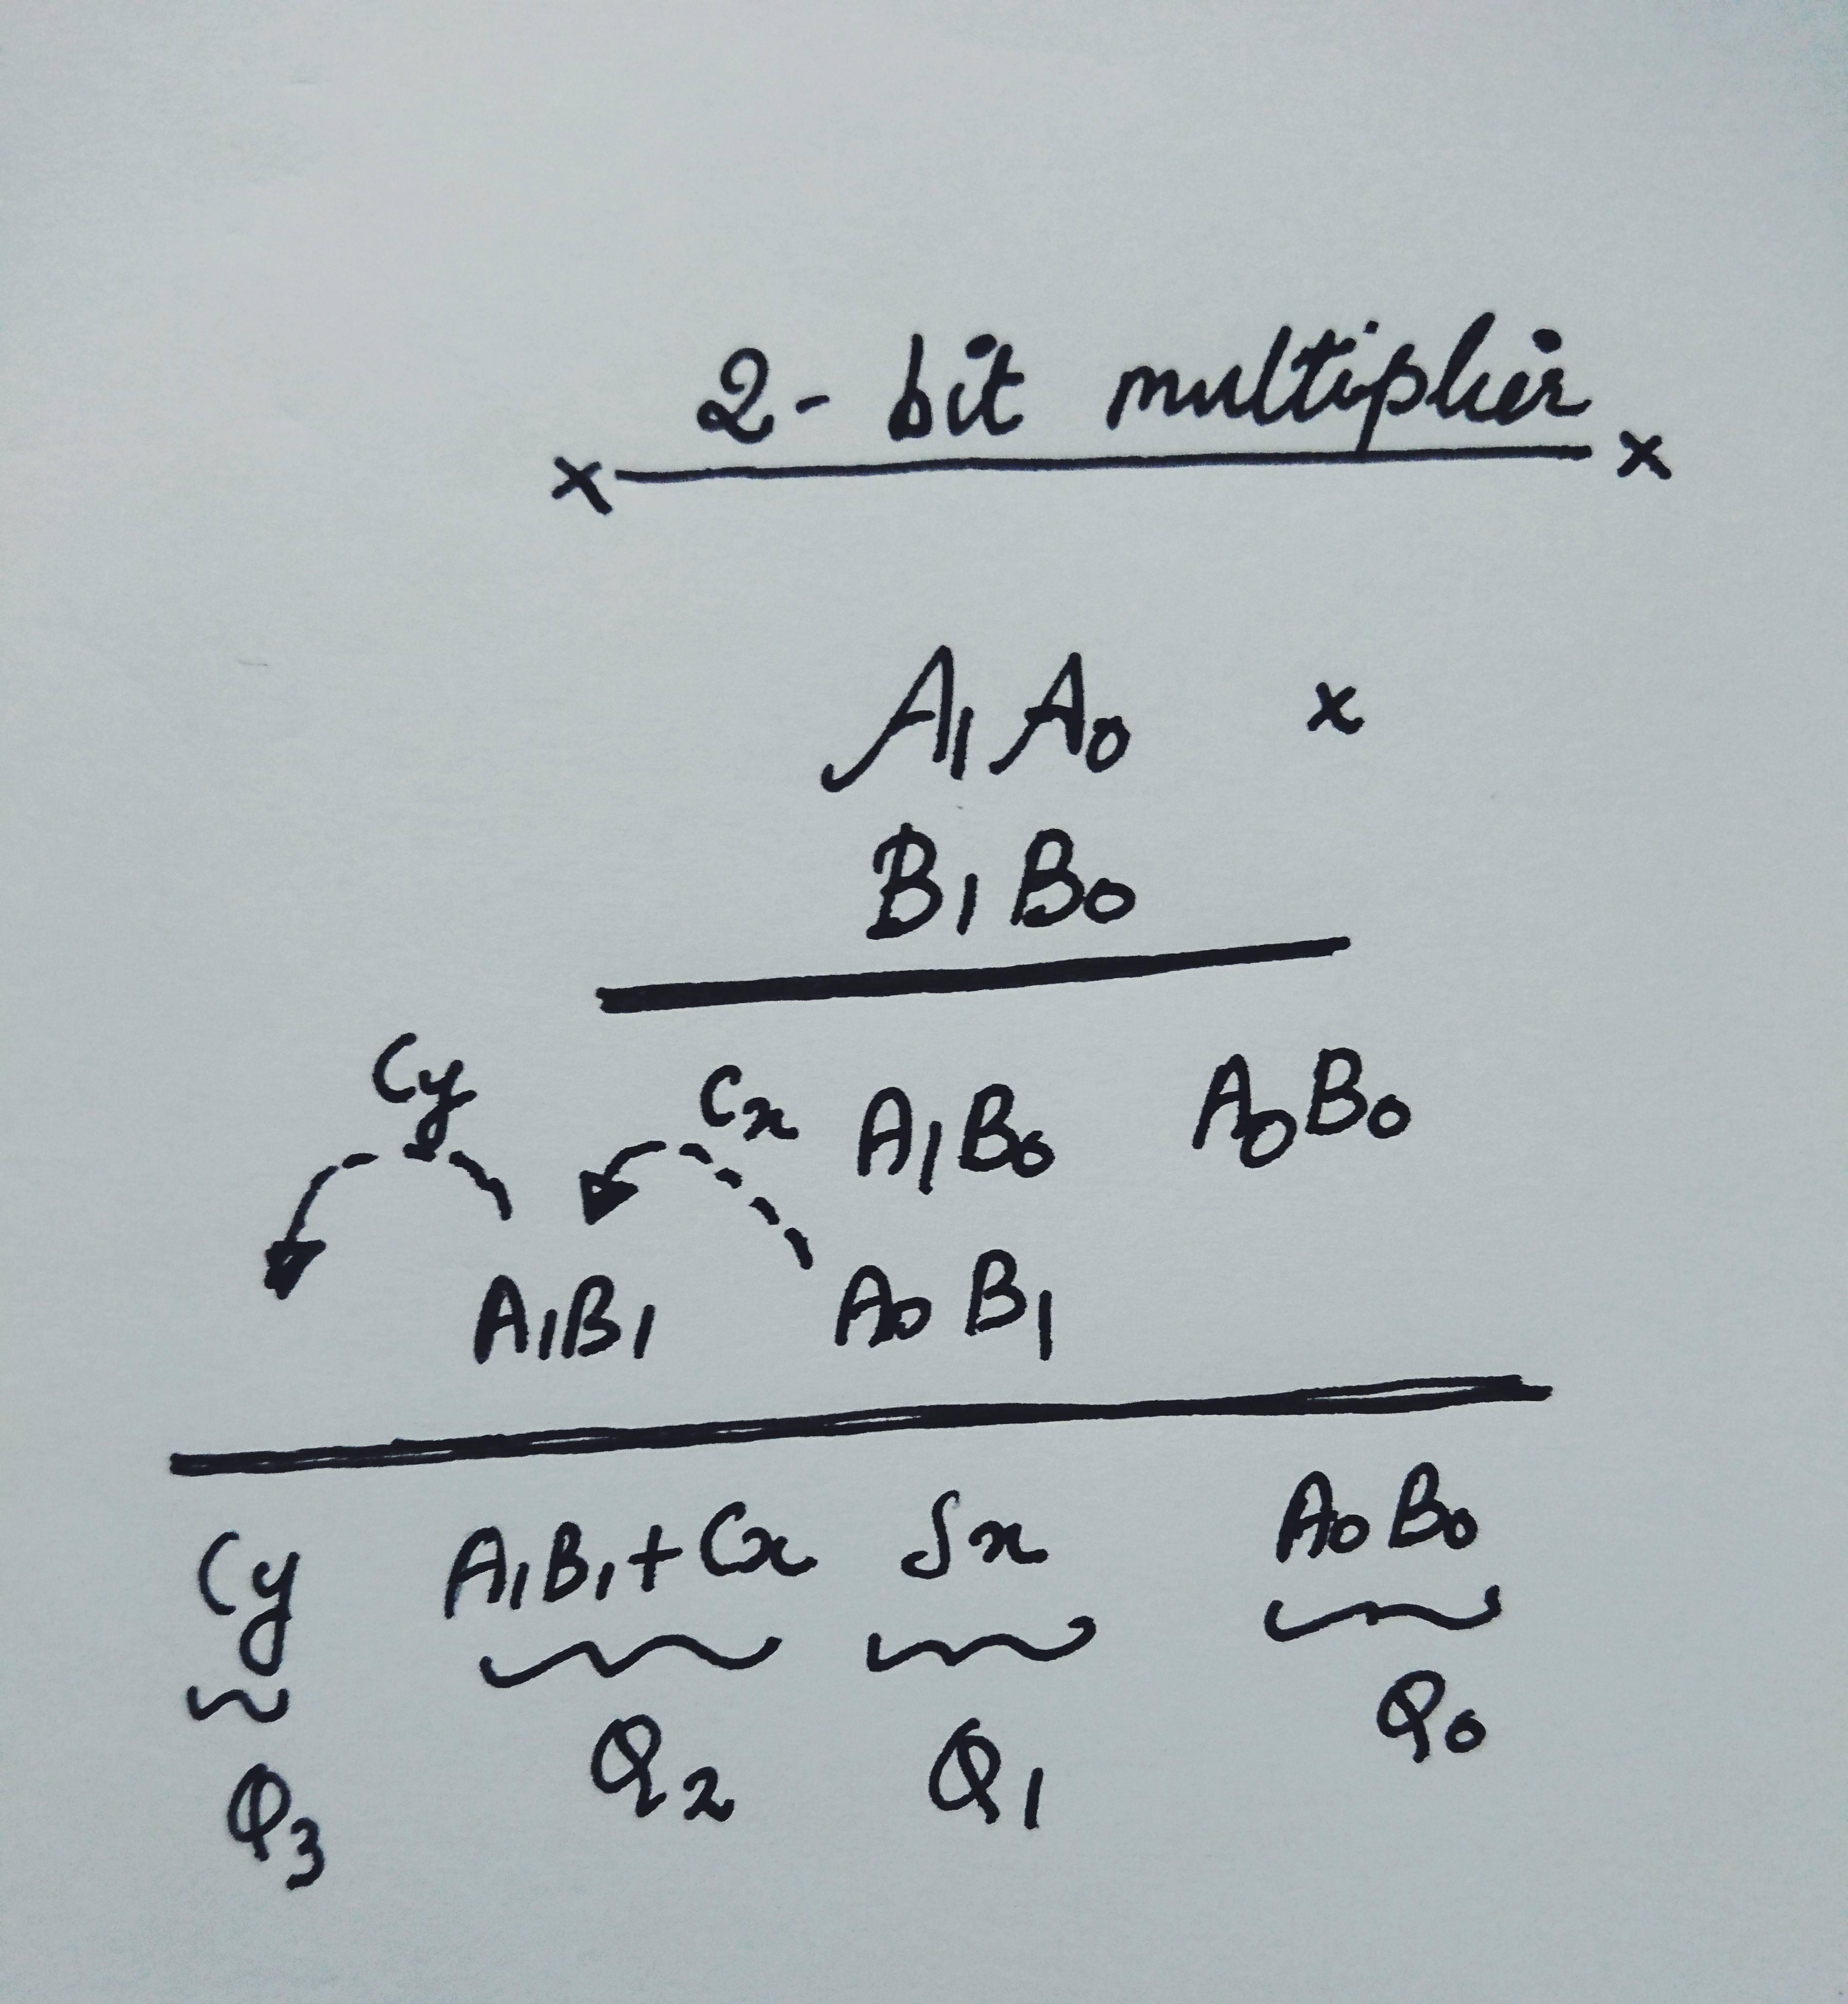 2 Bit Multiplier Logic Diagram